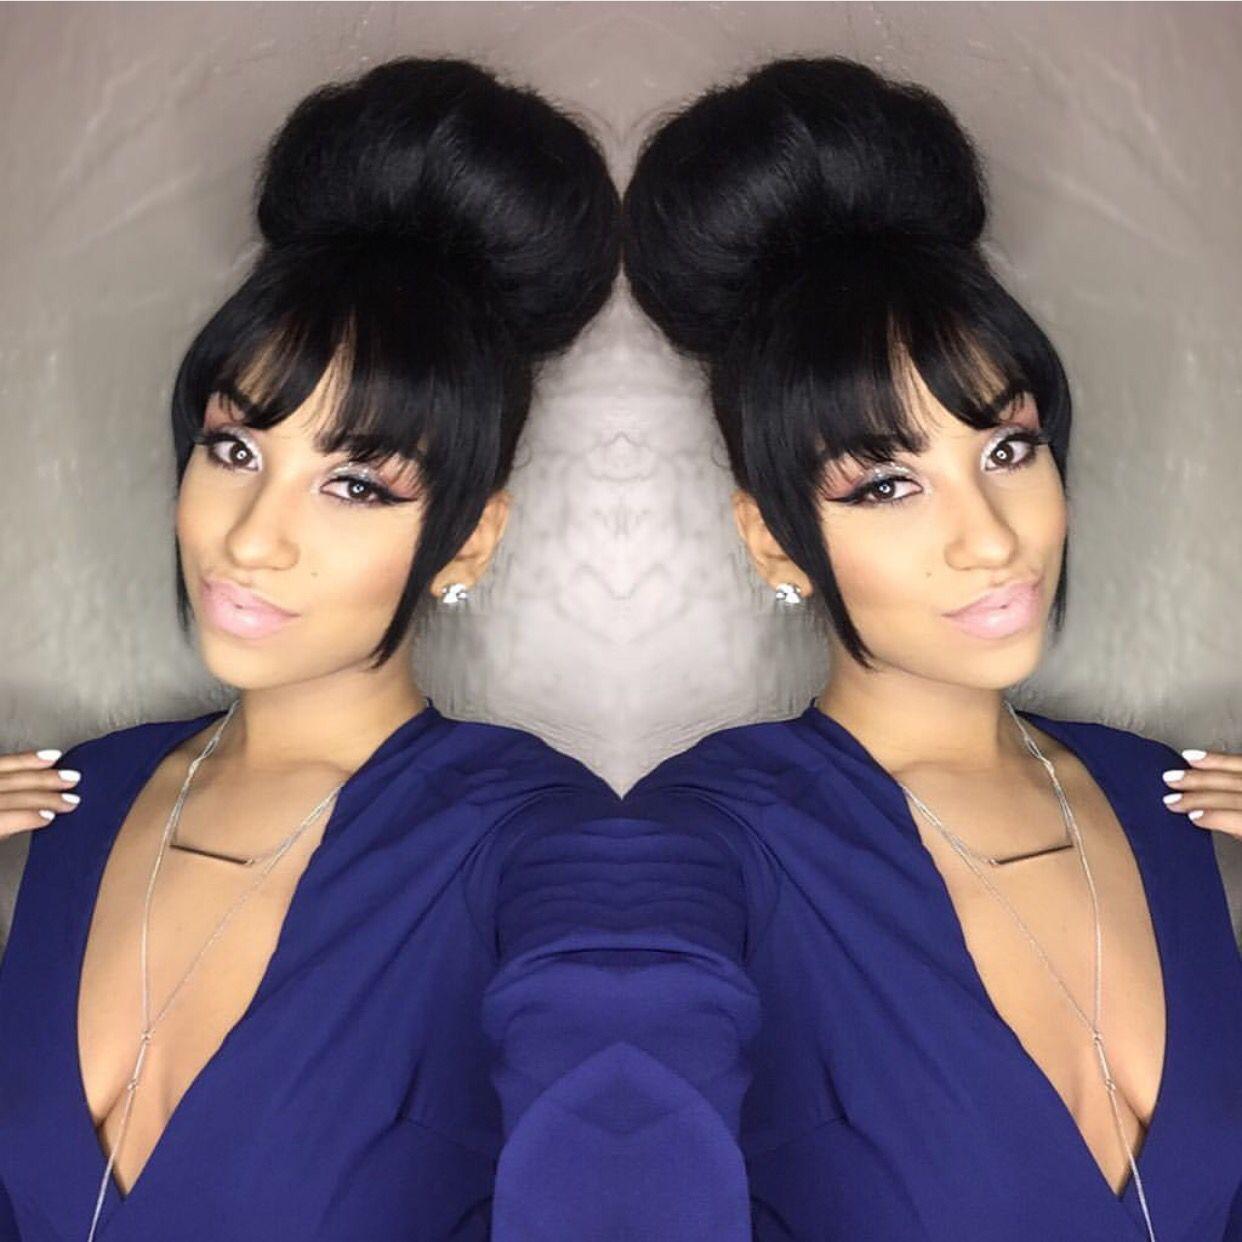 bun x bangs | mane attraction | pinterest | bangs, hair style and